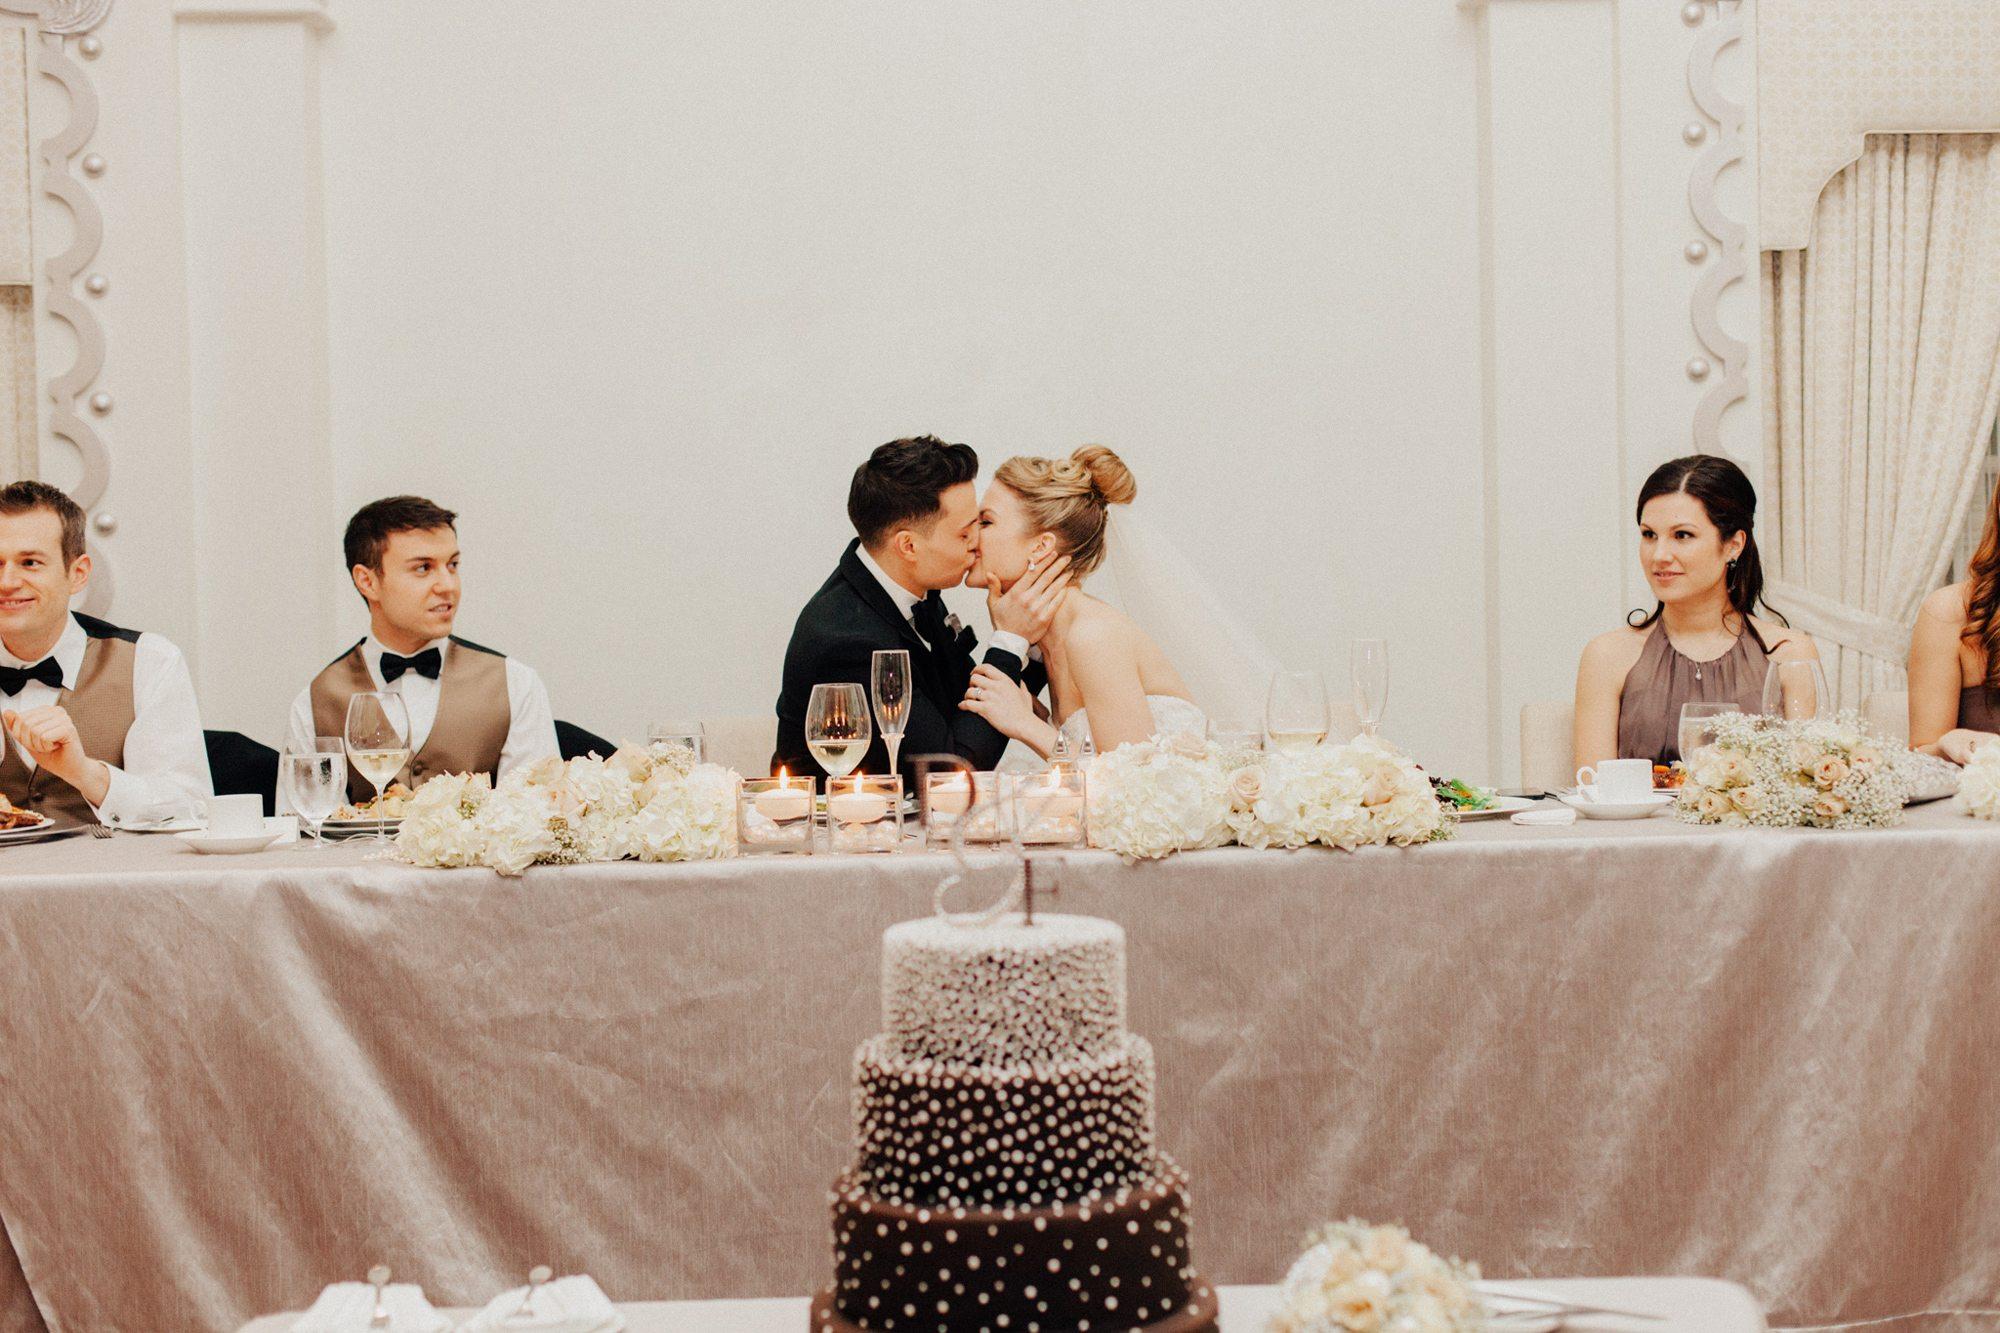 069-vancouver-wedding-photographer